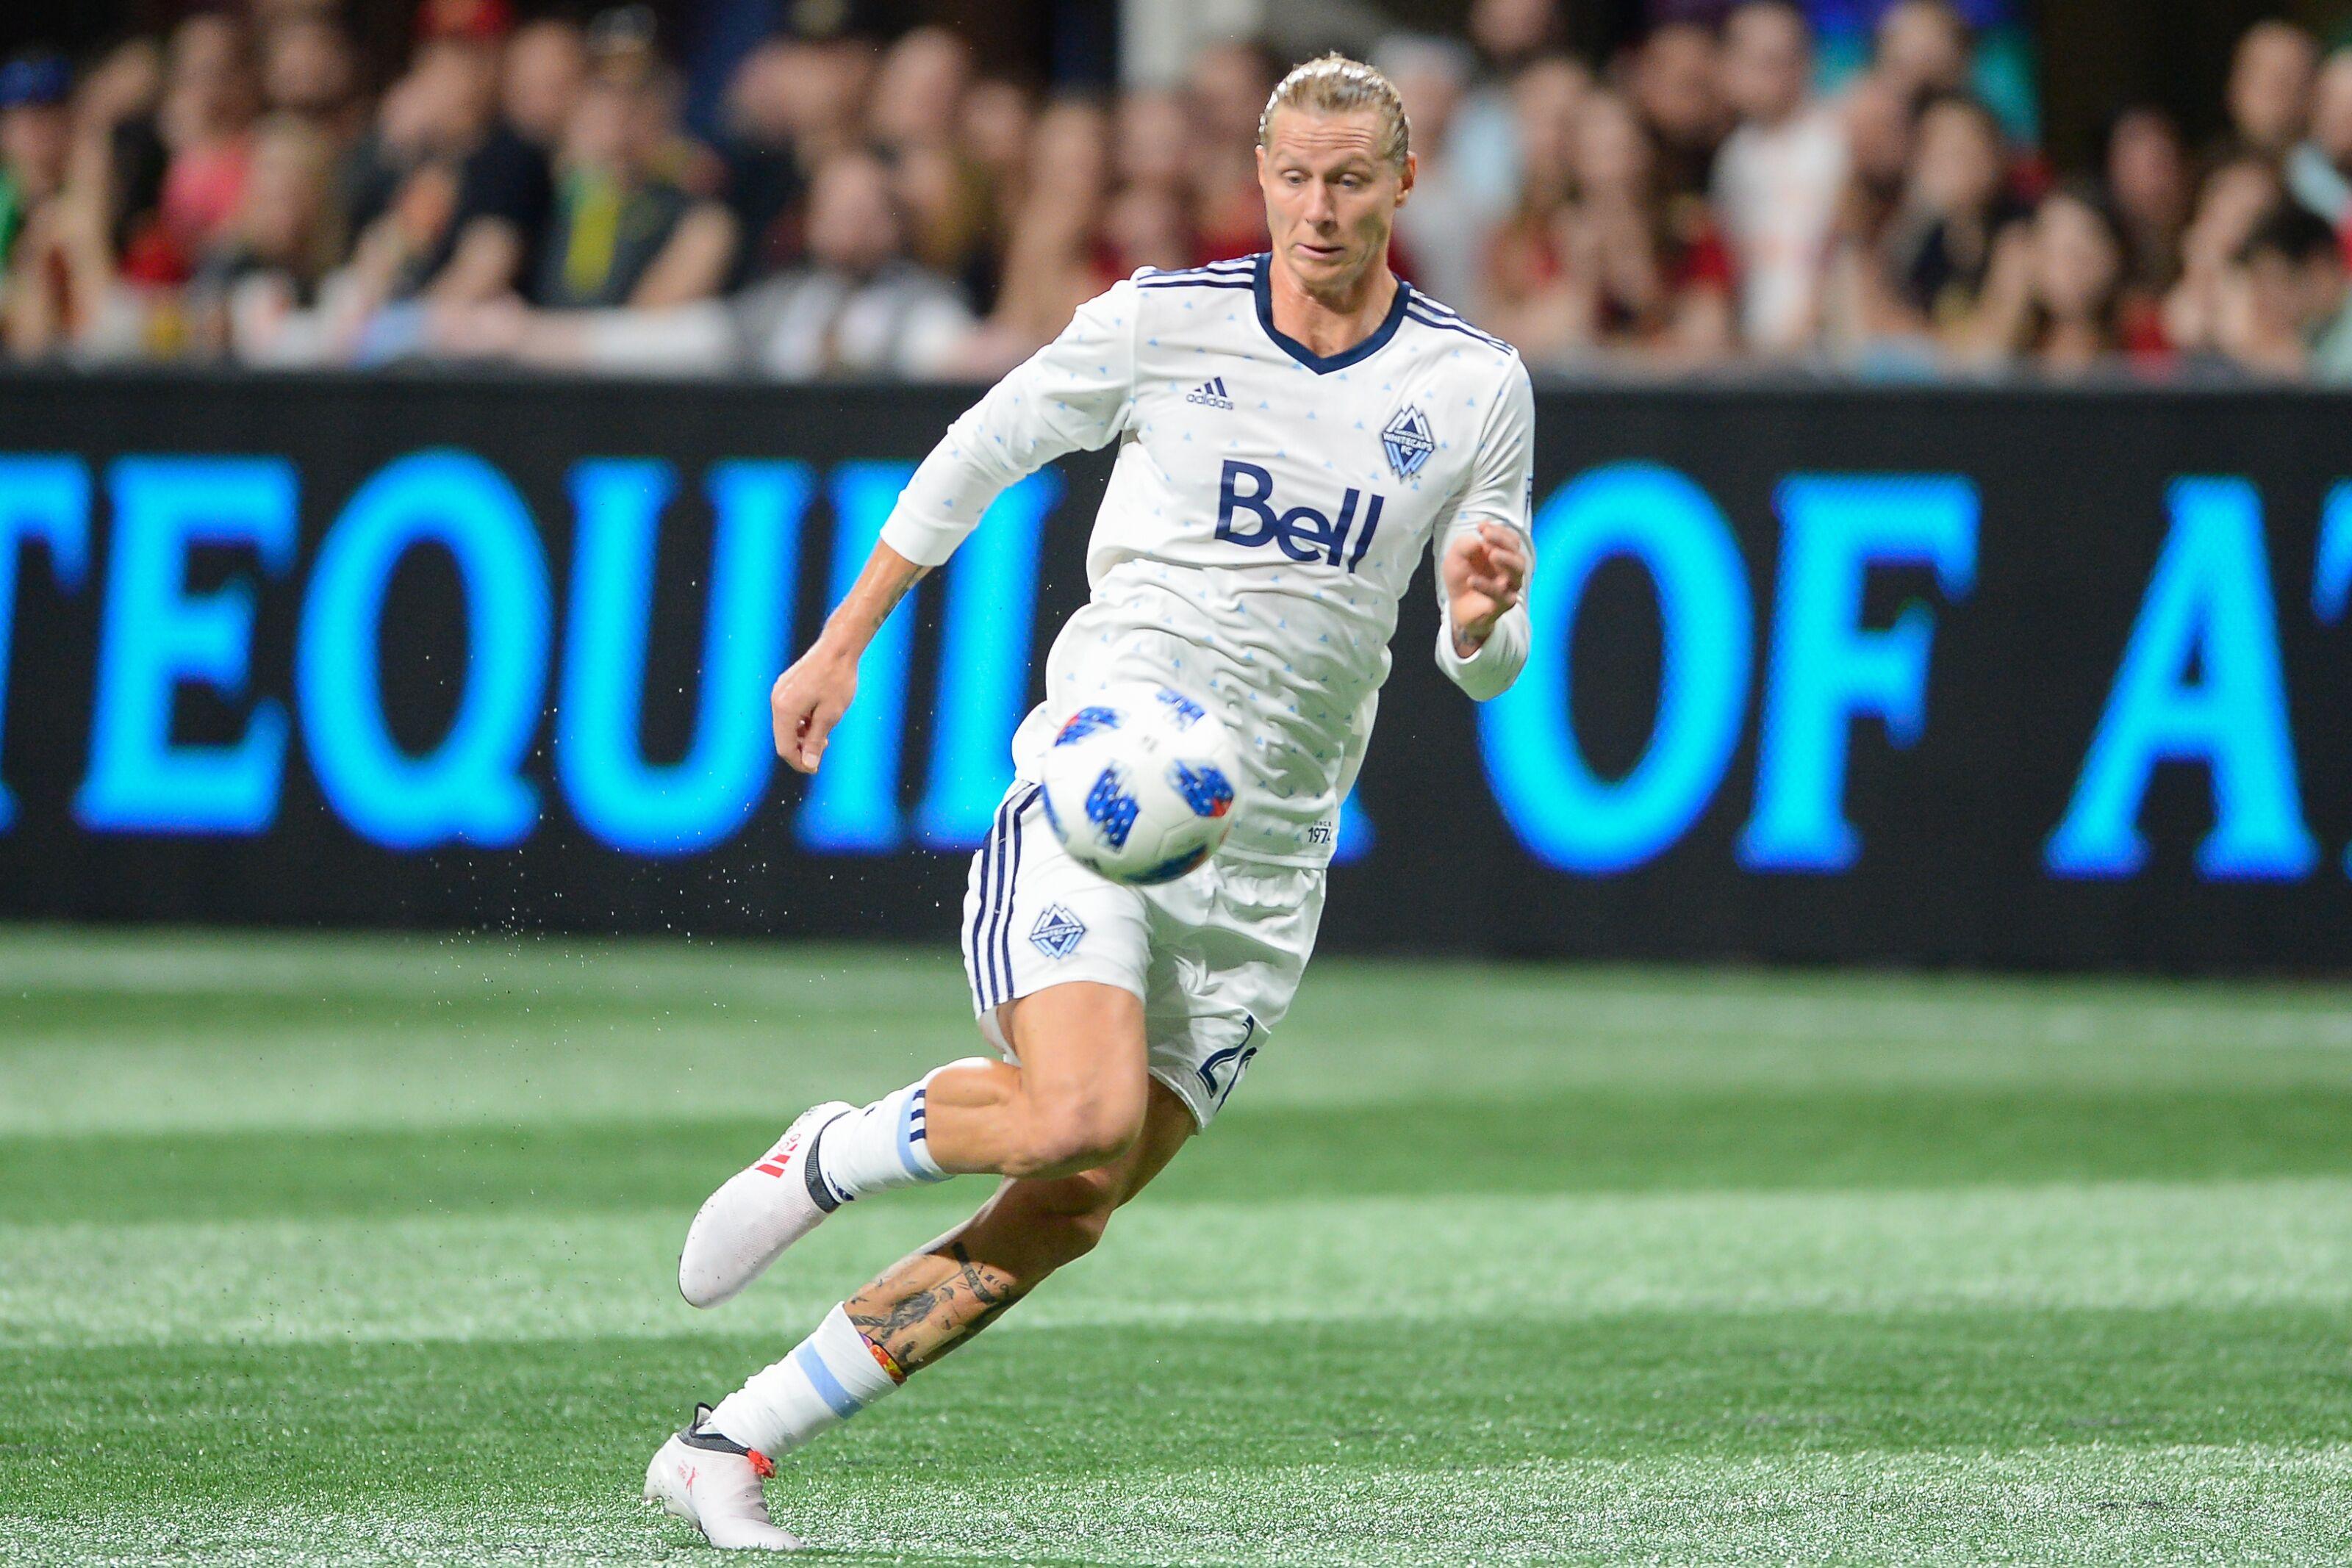 Atlanta United and Brek Shea: Progress stopper or versatile depth?